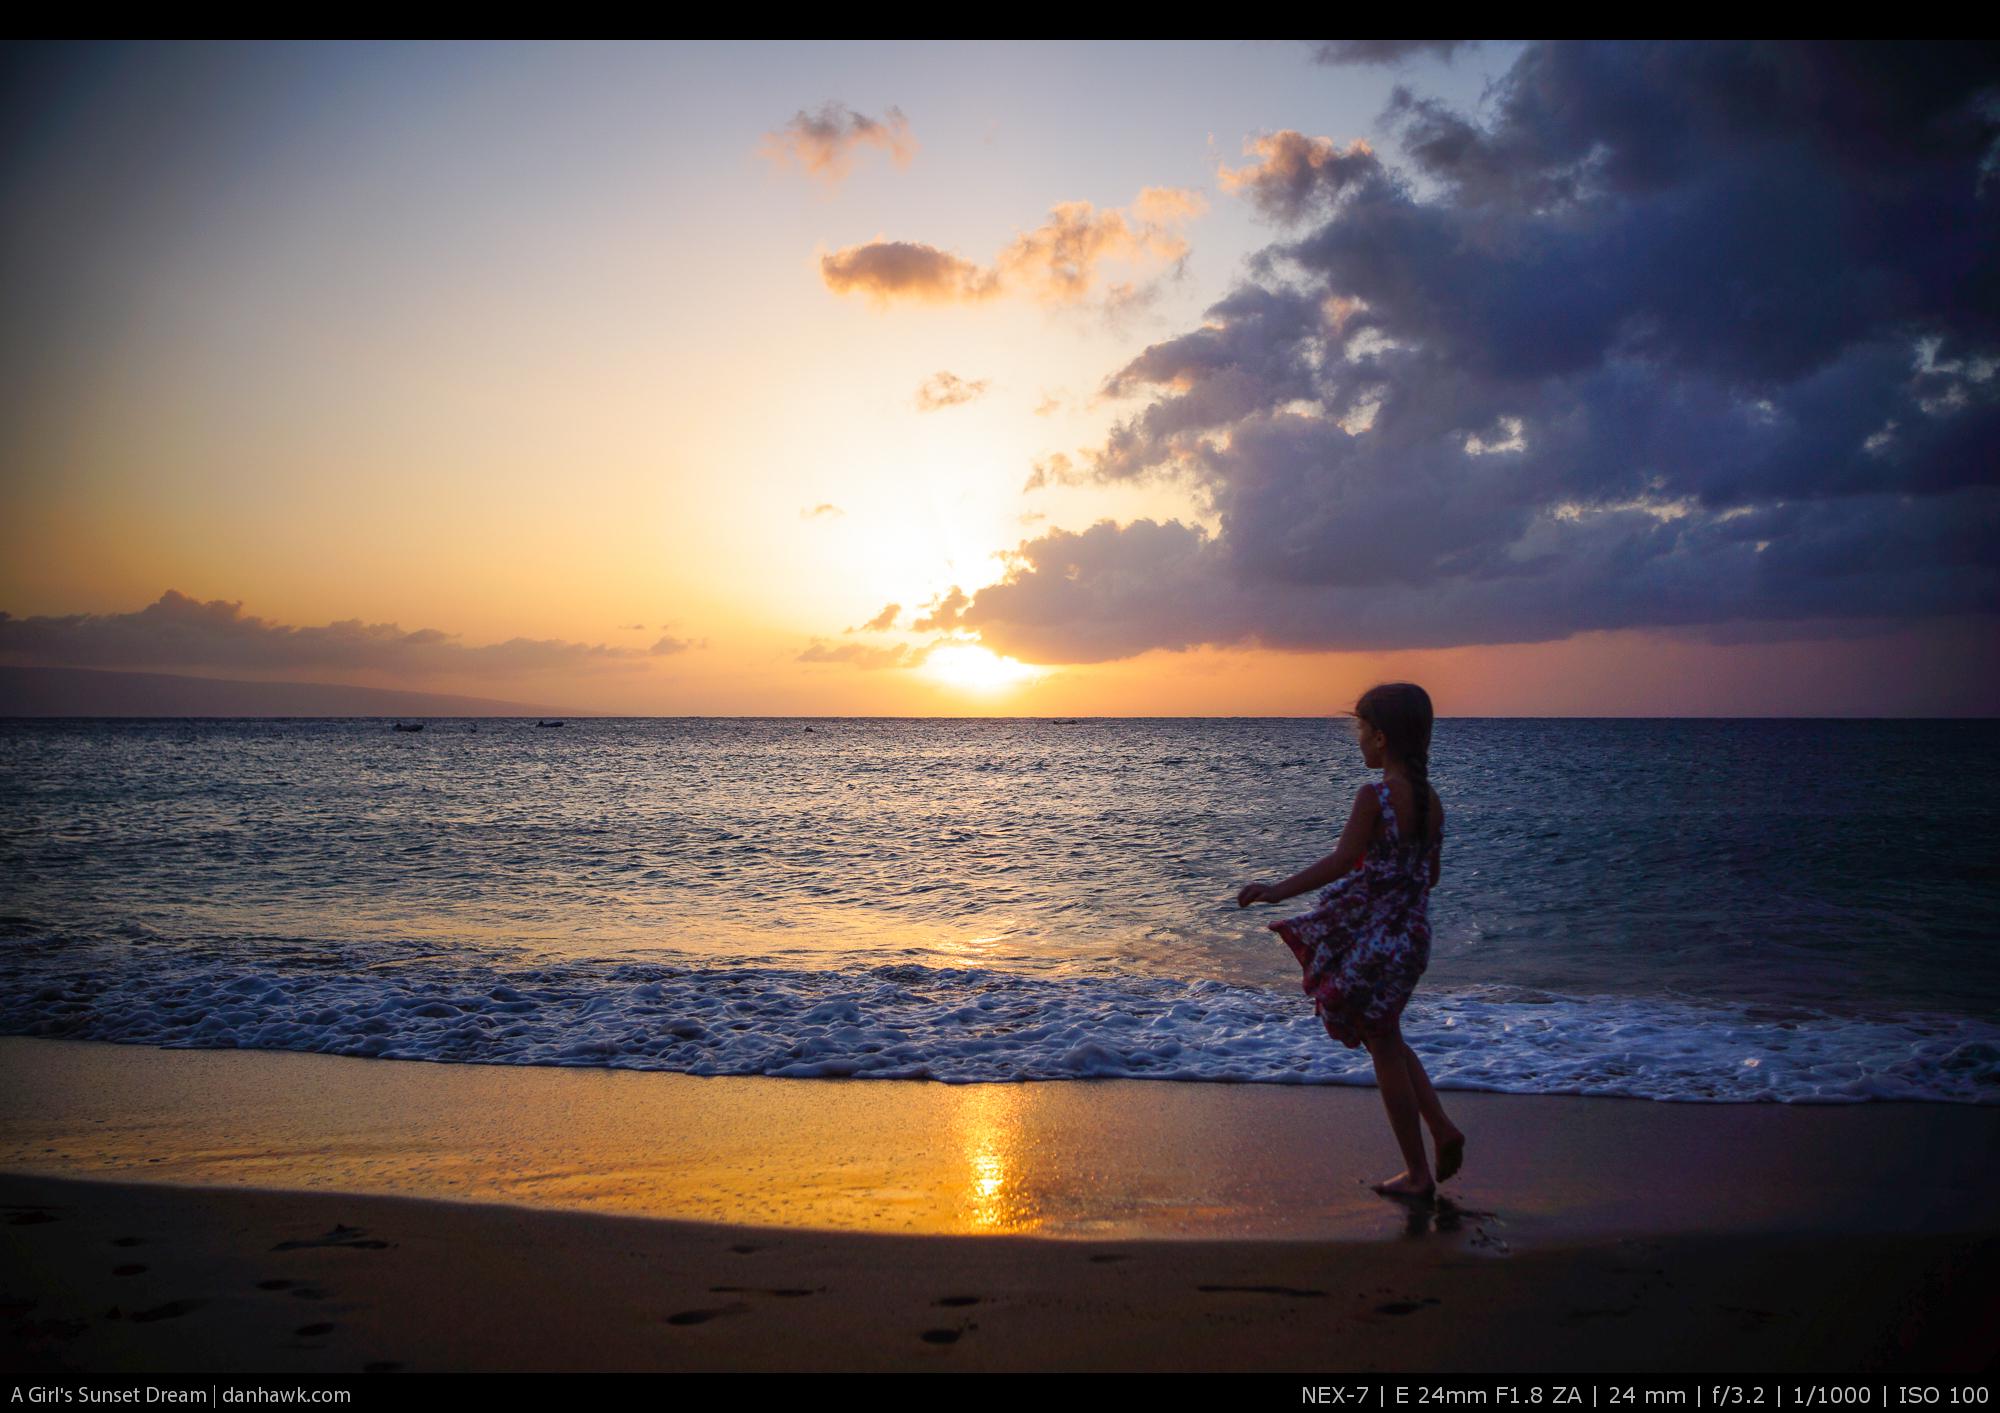 A Girl's Sunset Dream